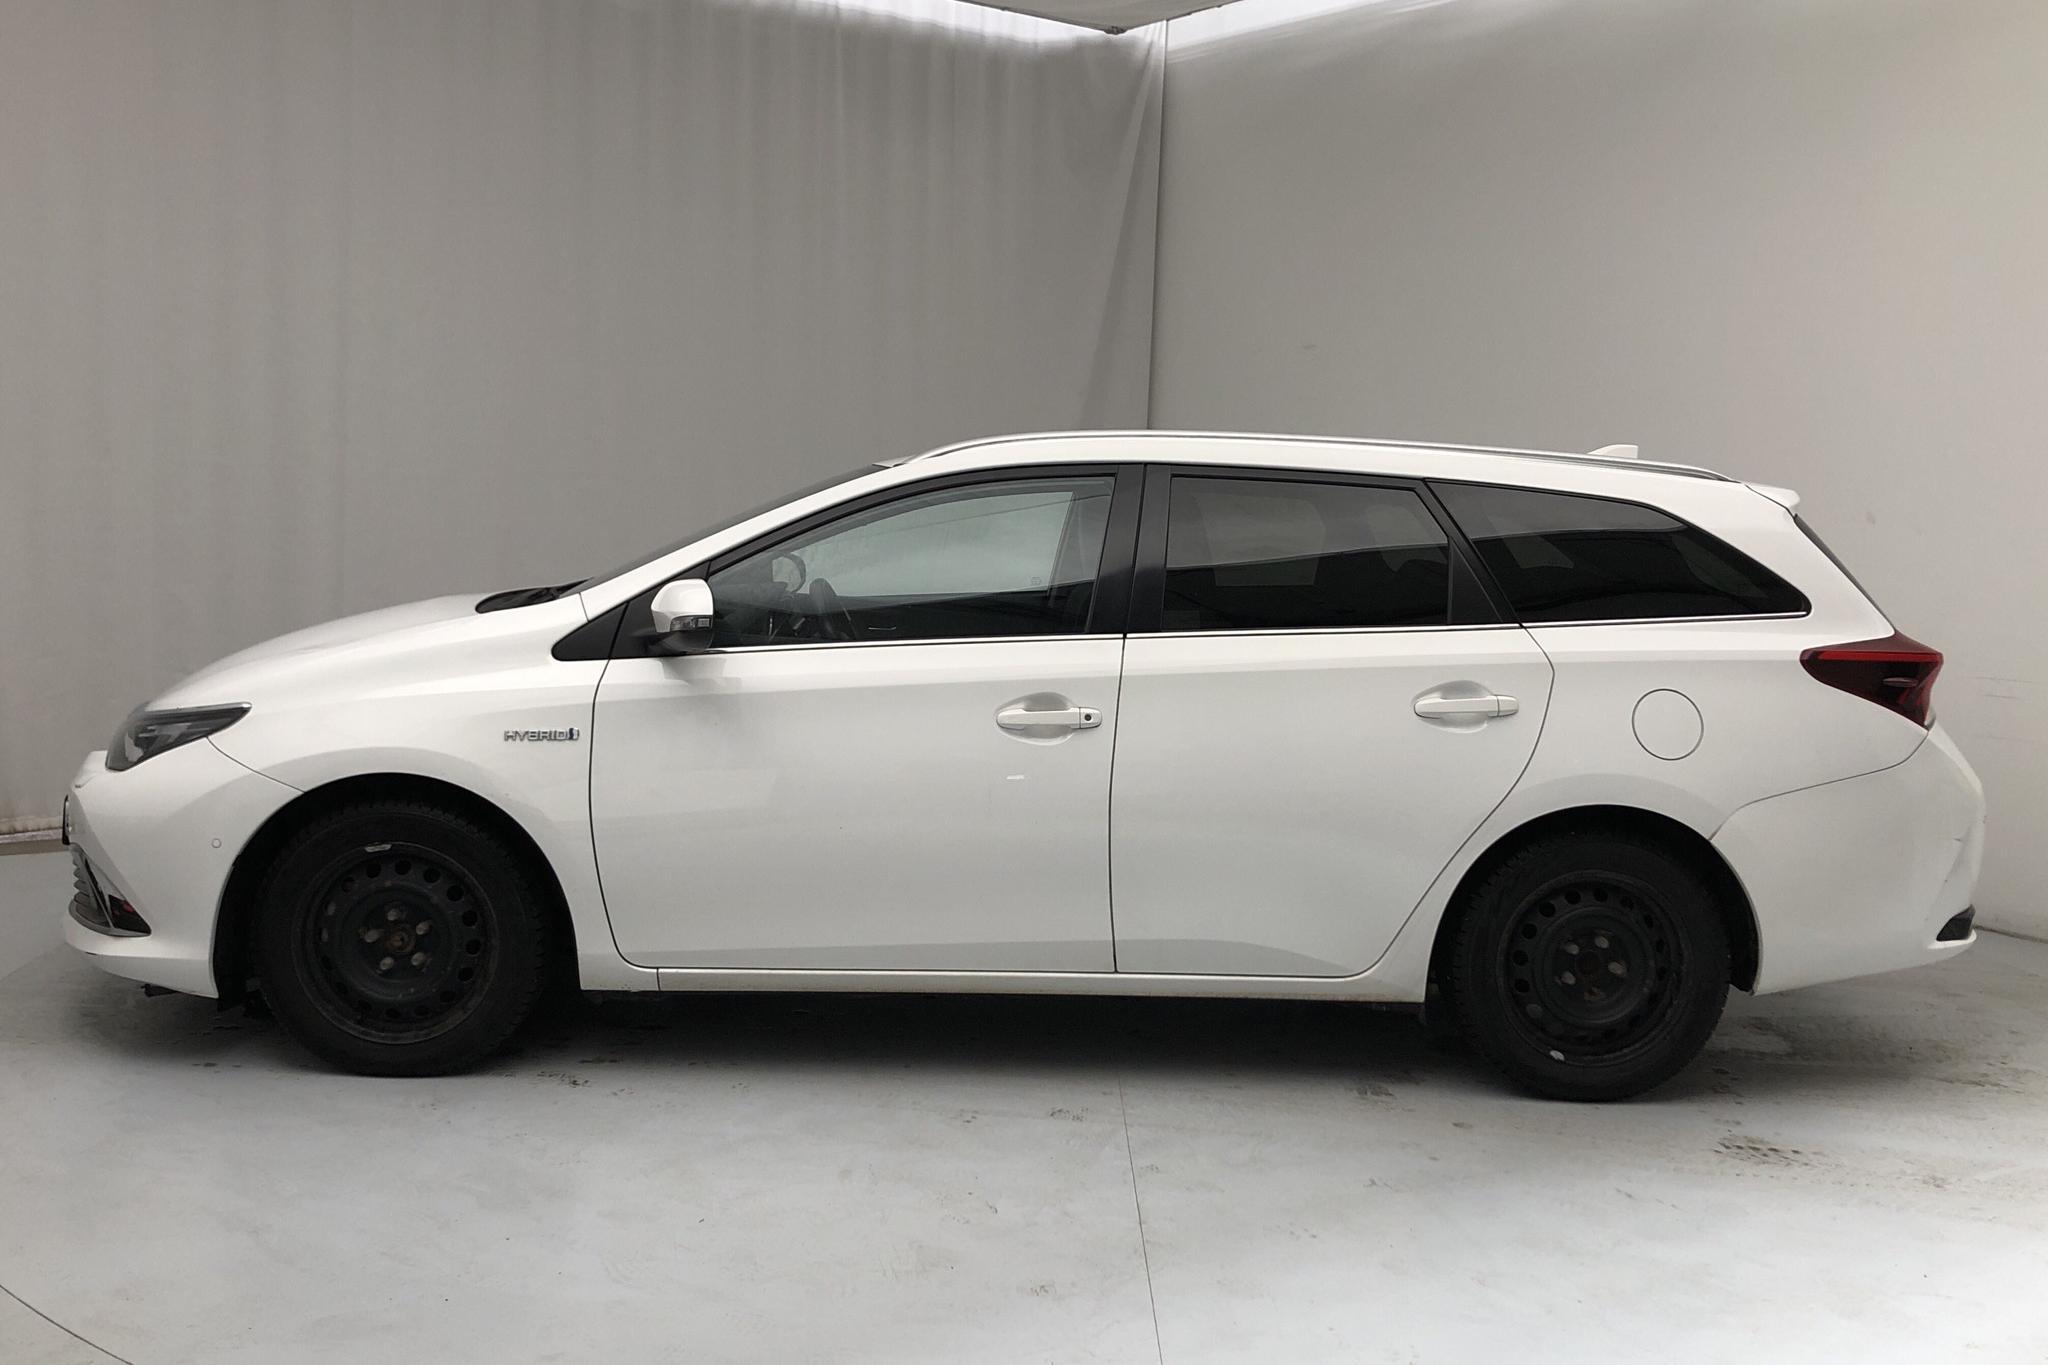 Toyota Auris 1.8 HSD Touring Sports (99hk) - 132 560 km - Automatic - white - 2017